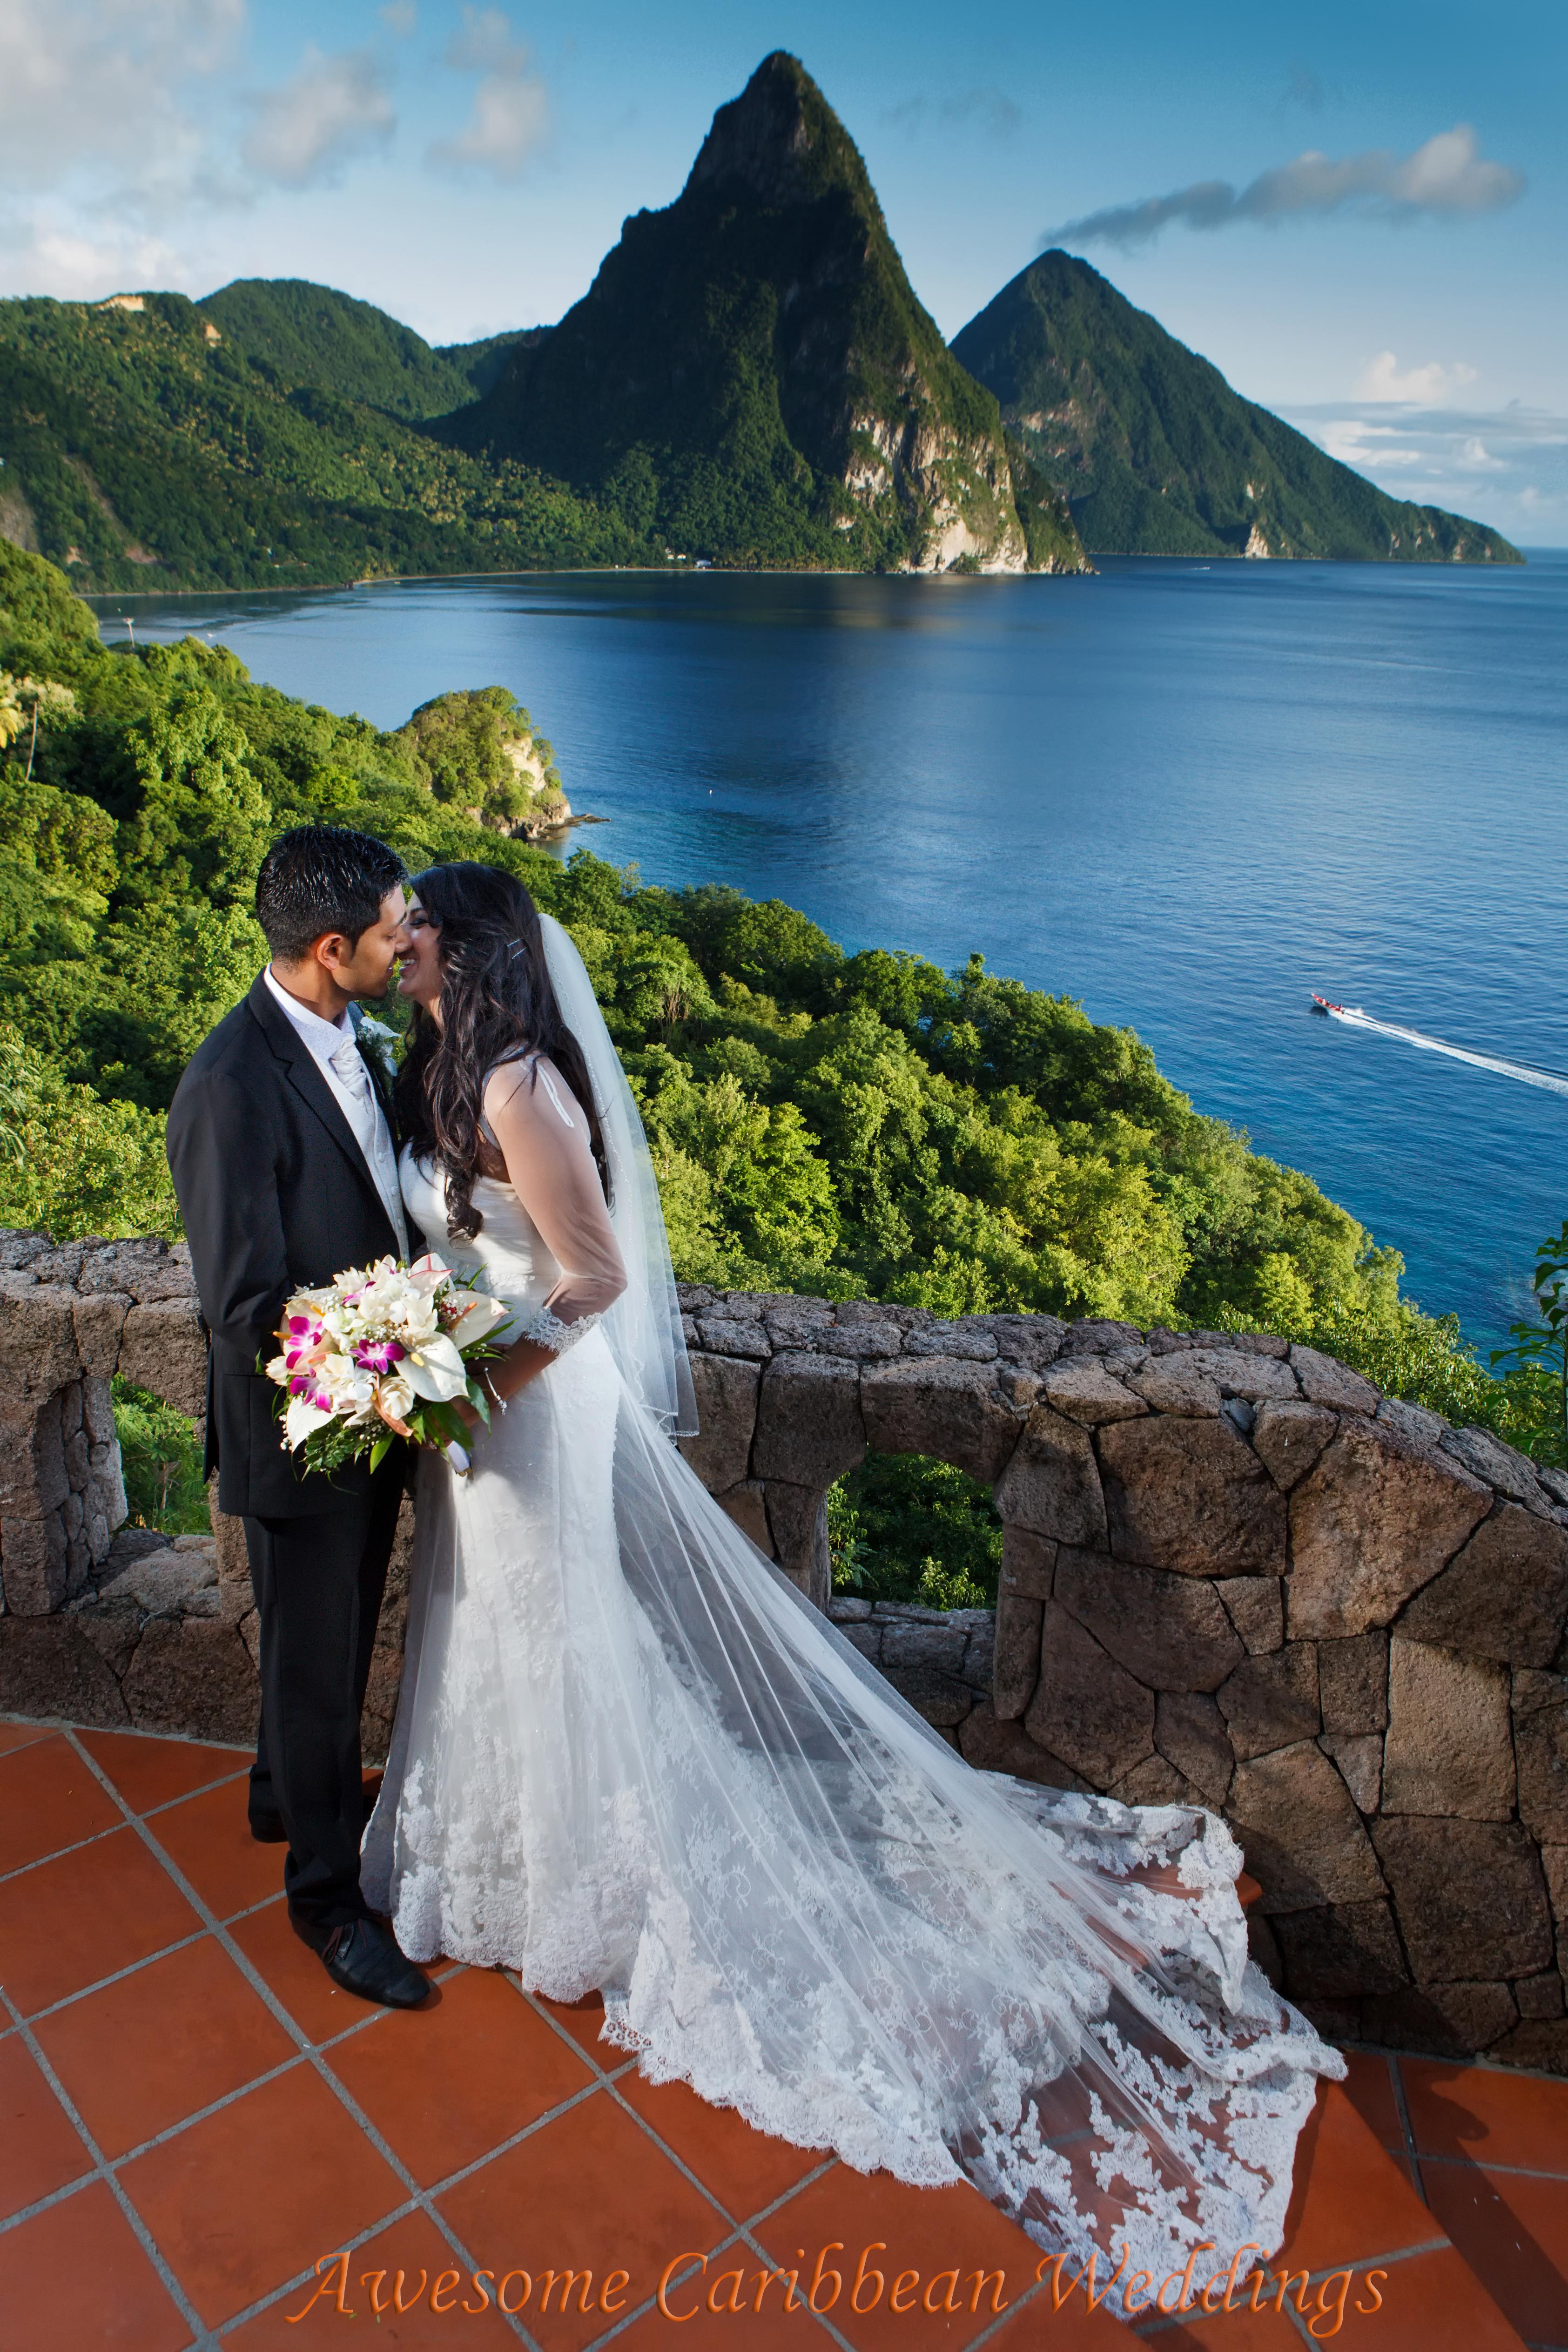 awesome caribbean weddings lilguy weddings